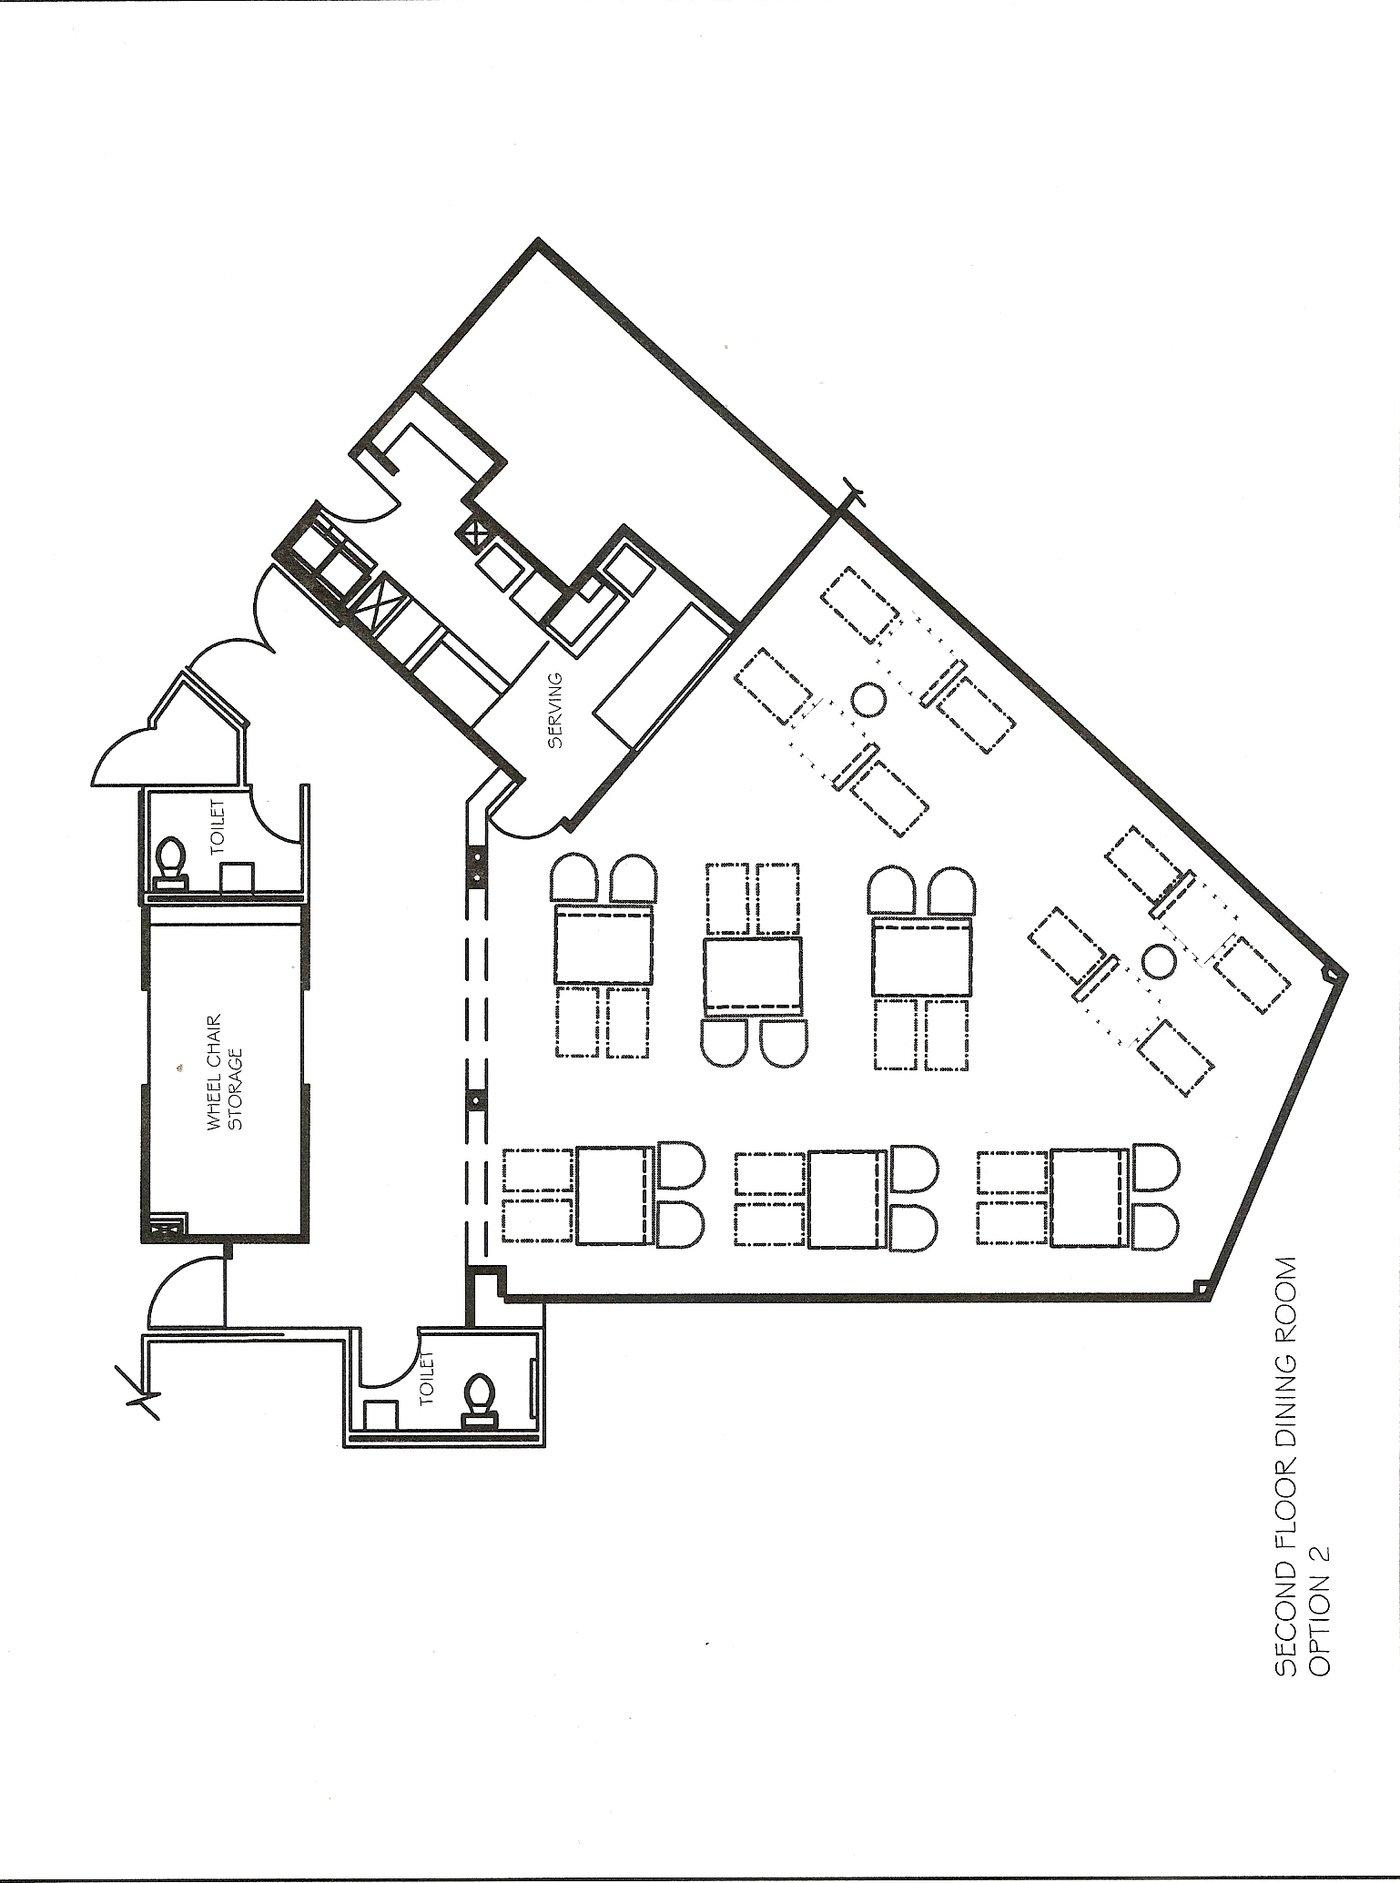 Nursing Home Room Floor Plans